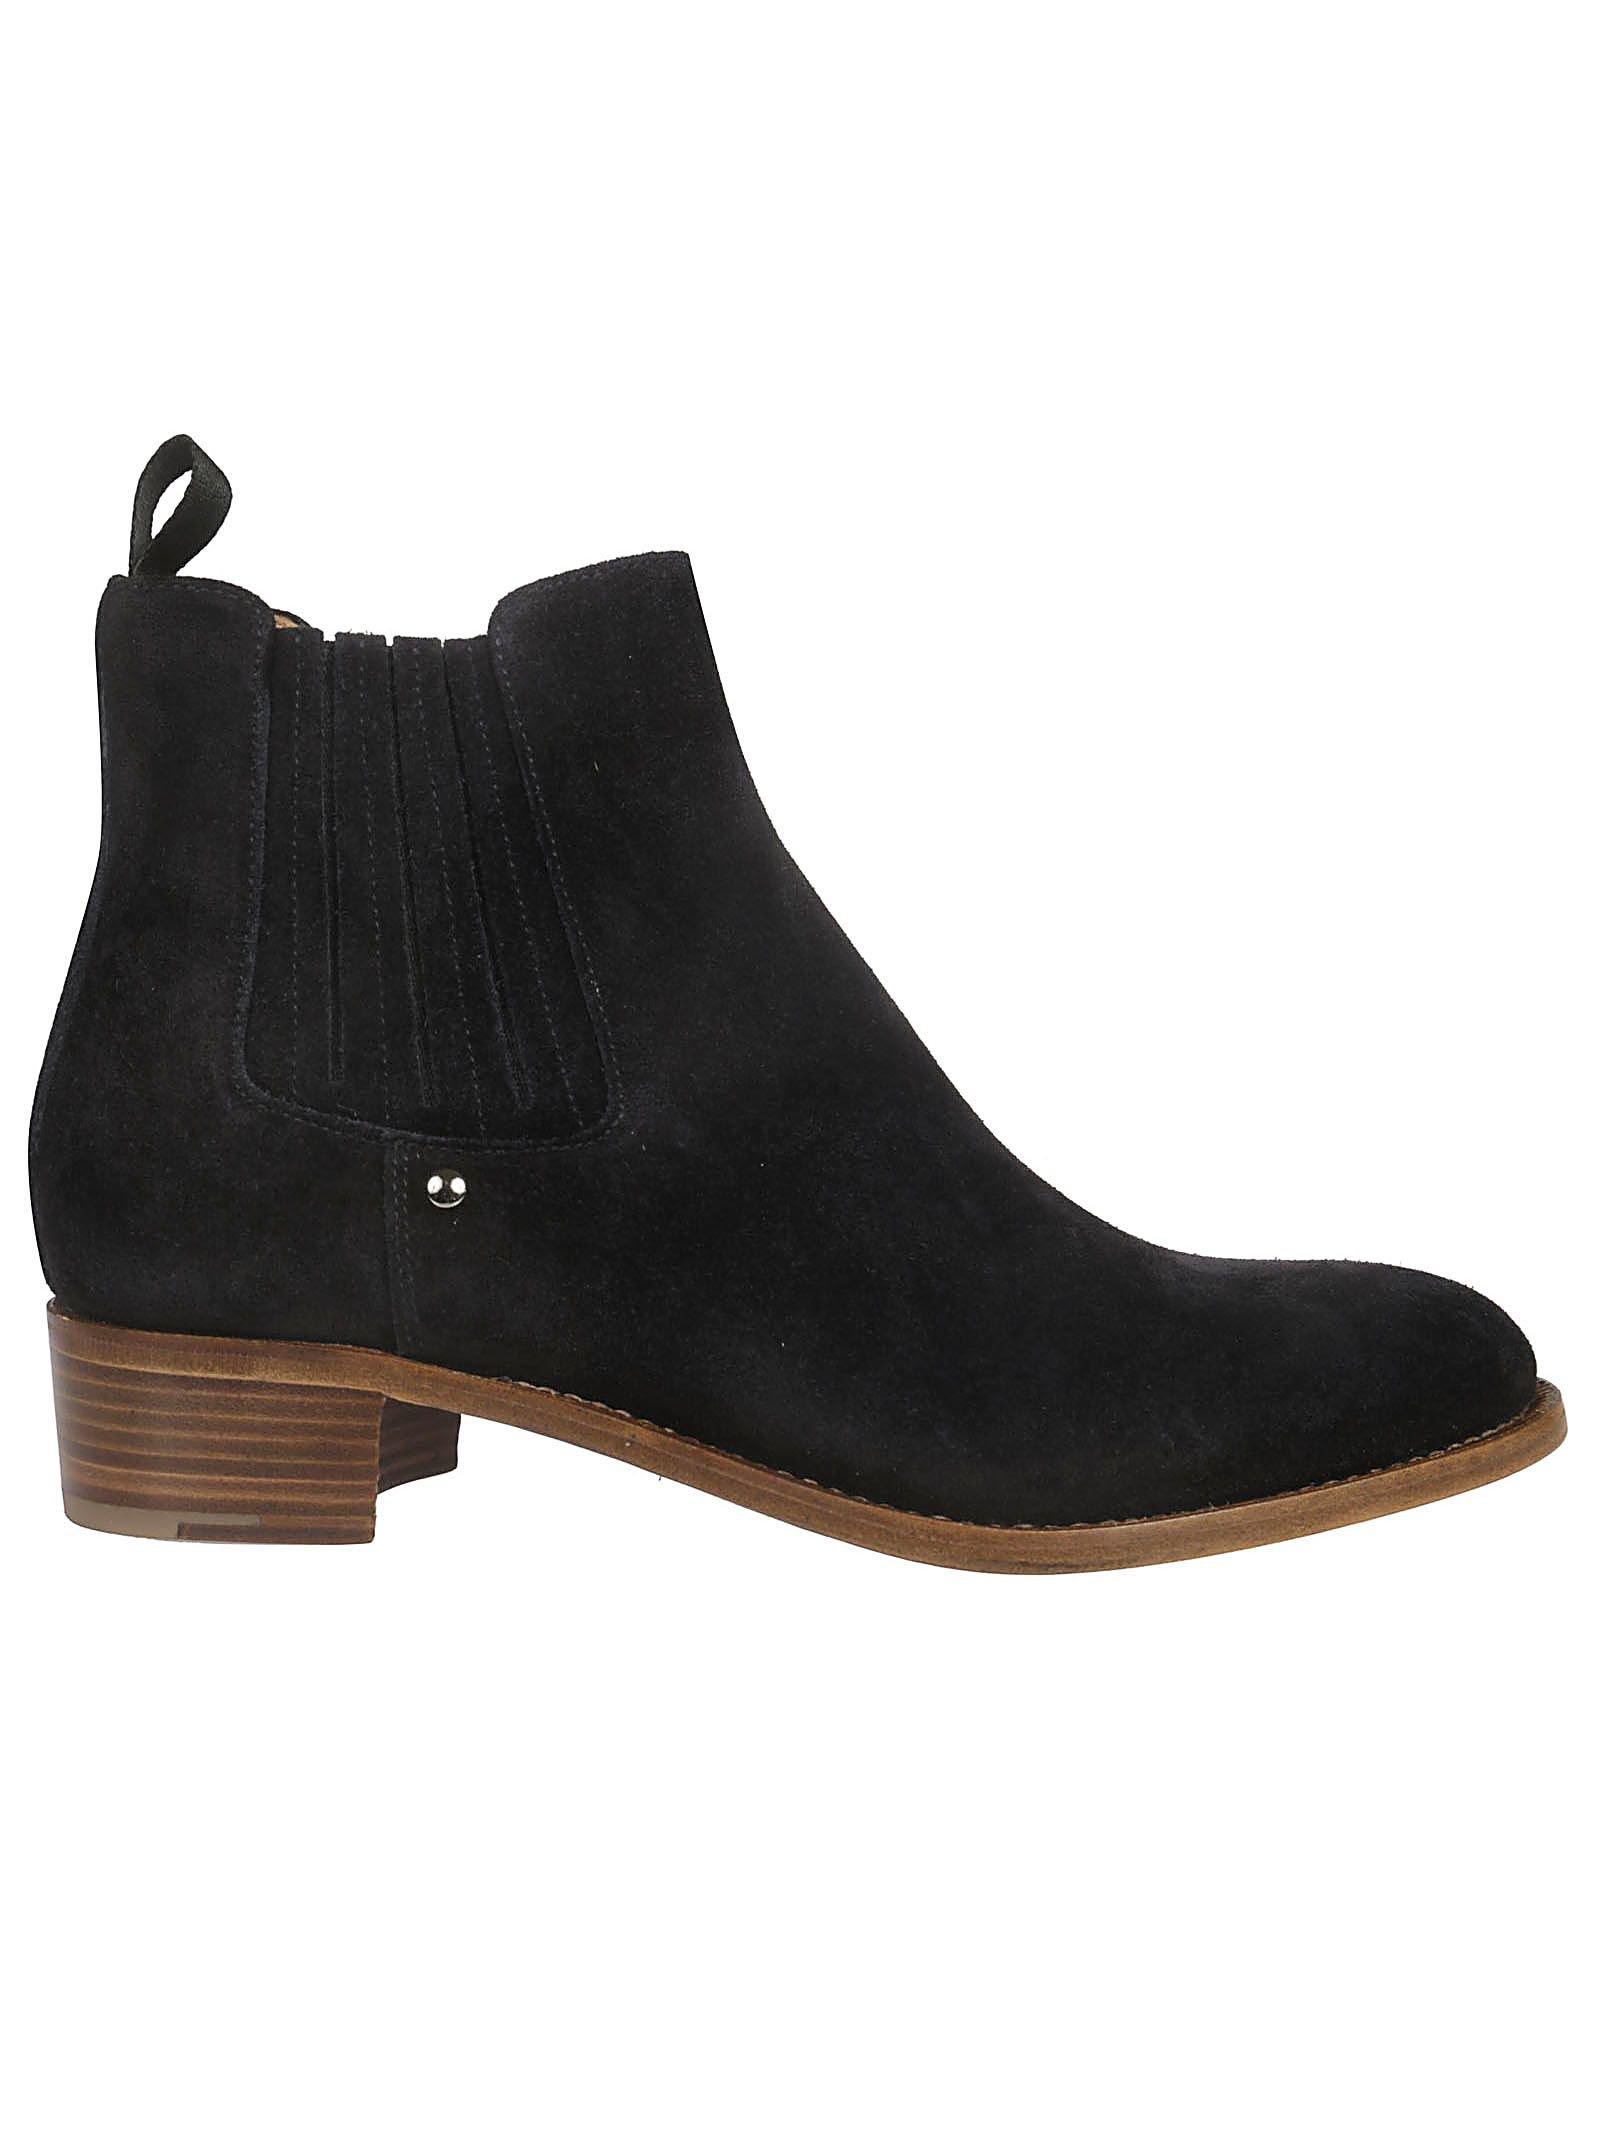 Churchs Chelsea Boots